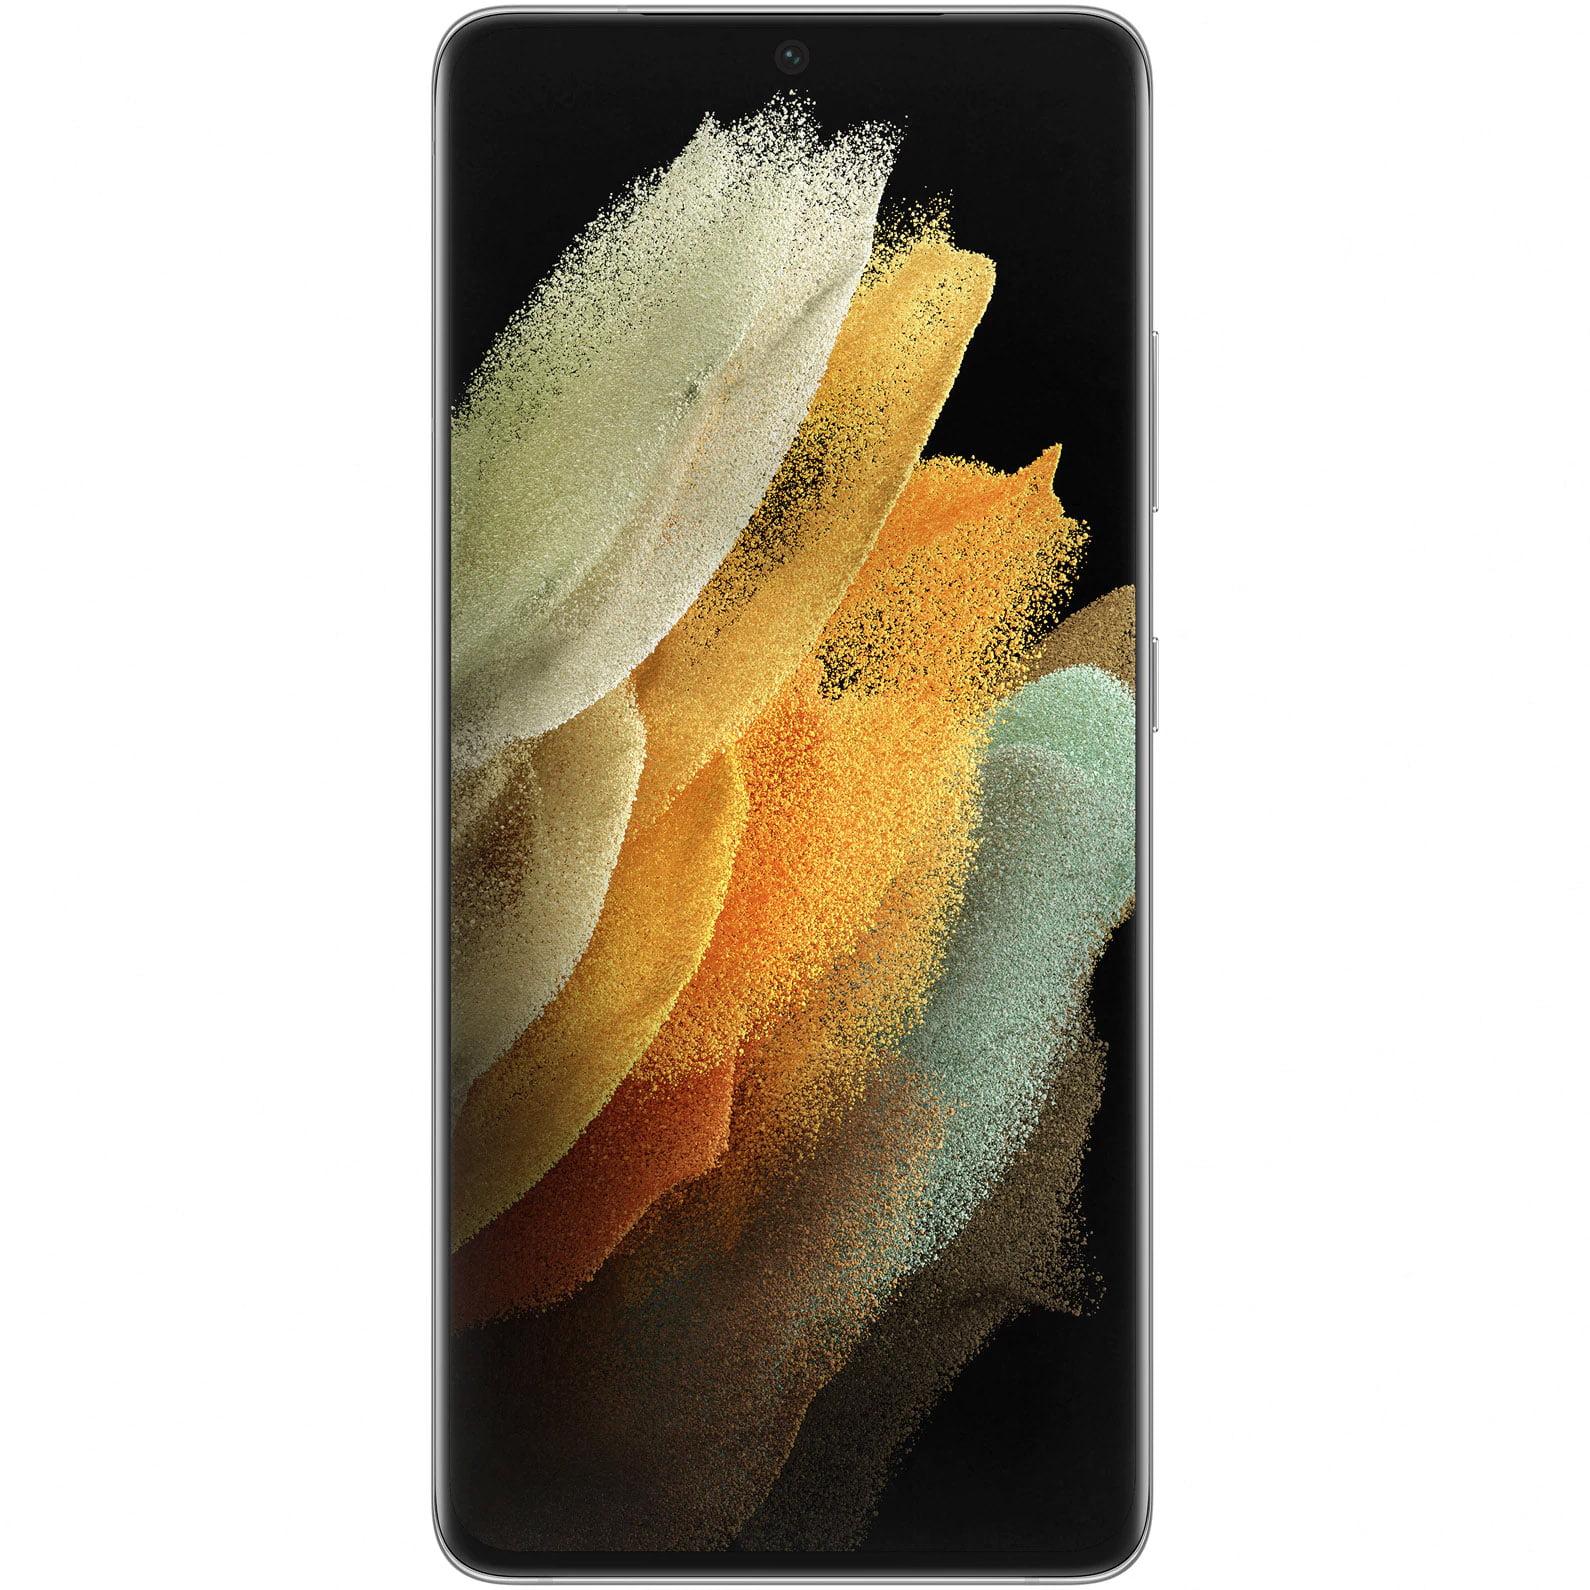 Telefon mobil Samsung Galaxy S21 Ultra, Dual SIM, 256GB, 12GB RAM, 5G, Phantom Silver